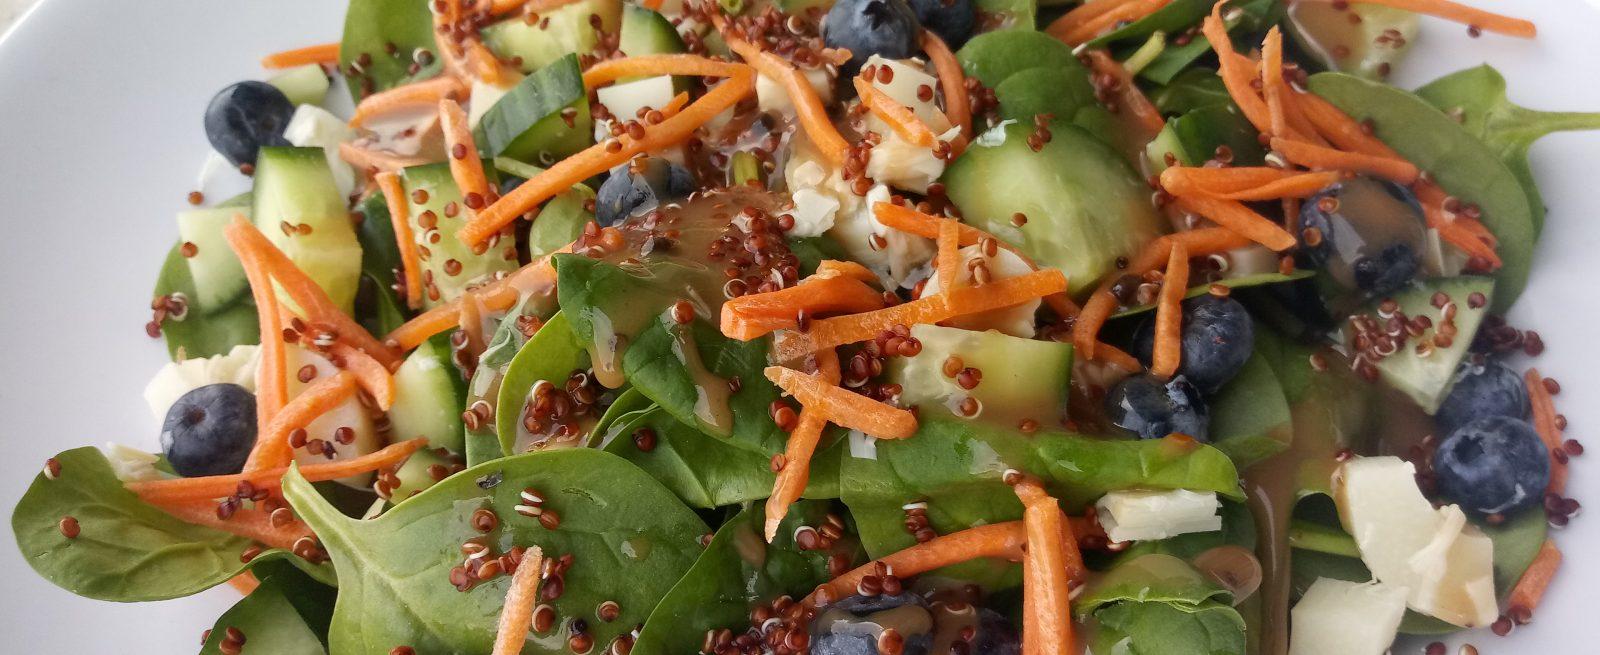 Veggie Alternatives At Brat Fest >> Mrm Plant Based Raised Rooted Fresh L A And Nozzarella Mrm